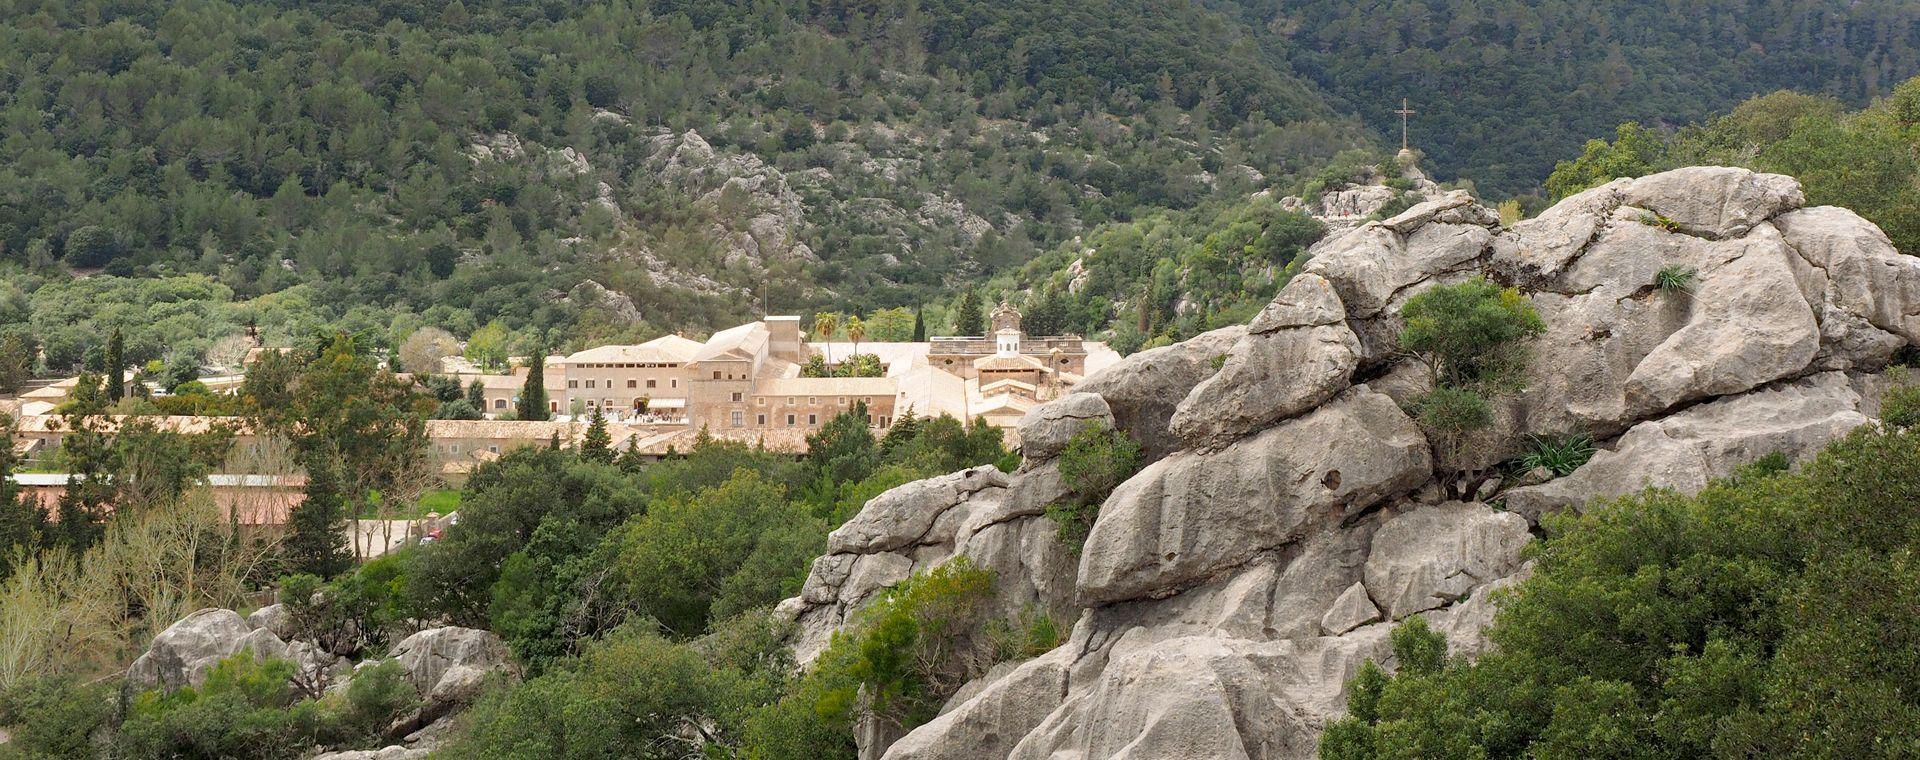 Image Archipel des Baléares : Majorque et Minorque